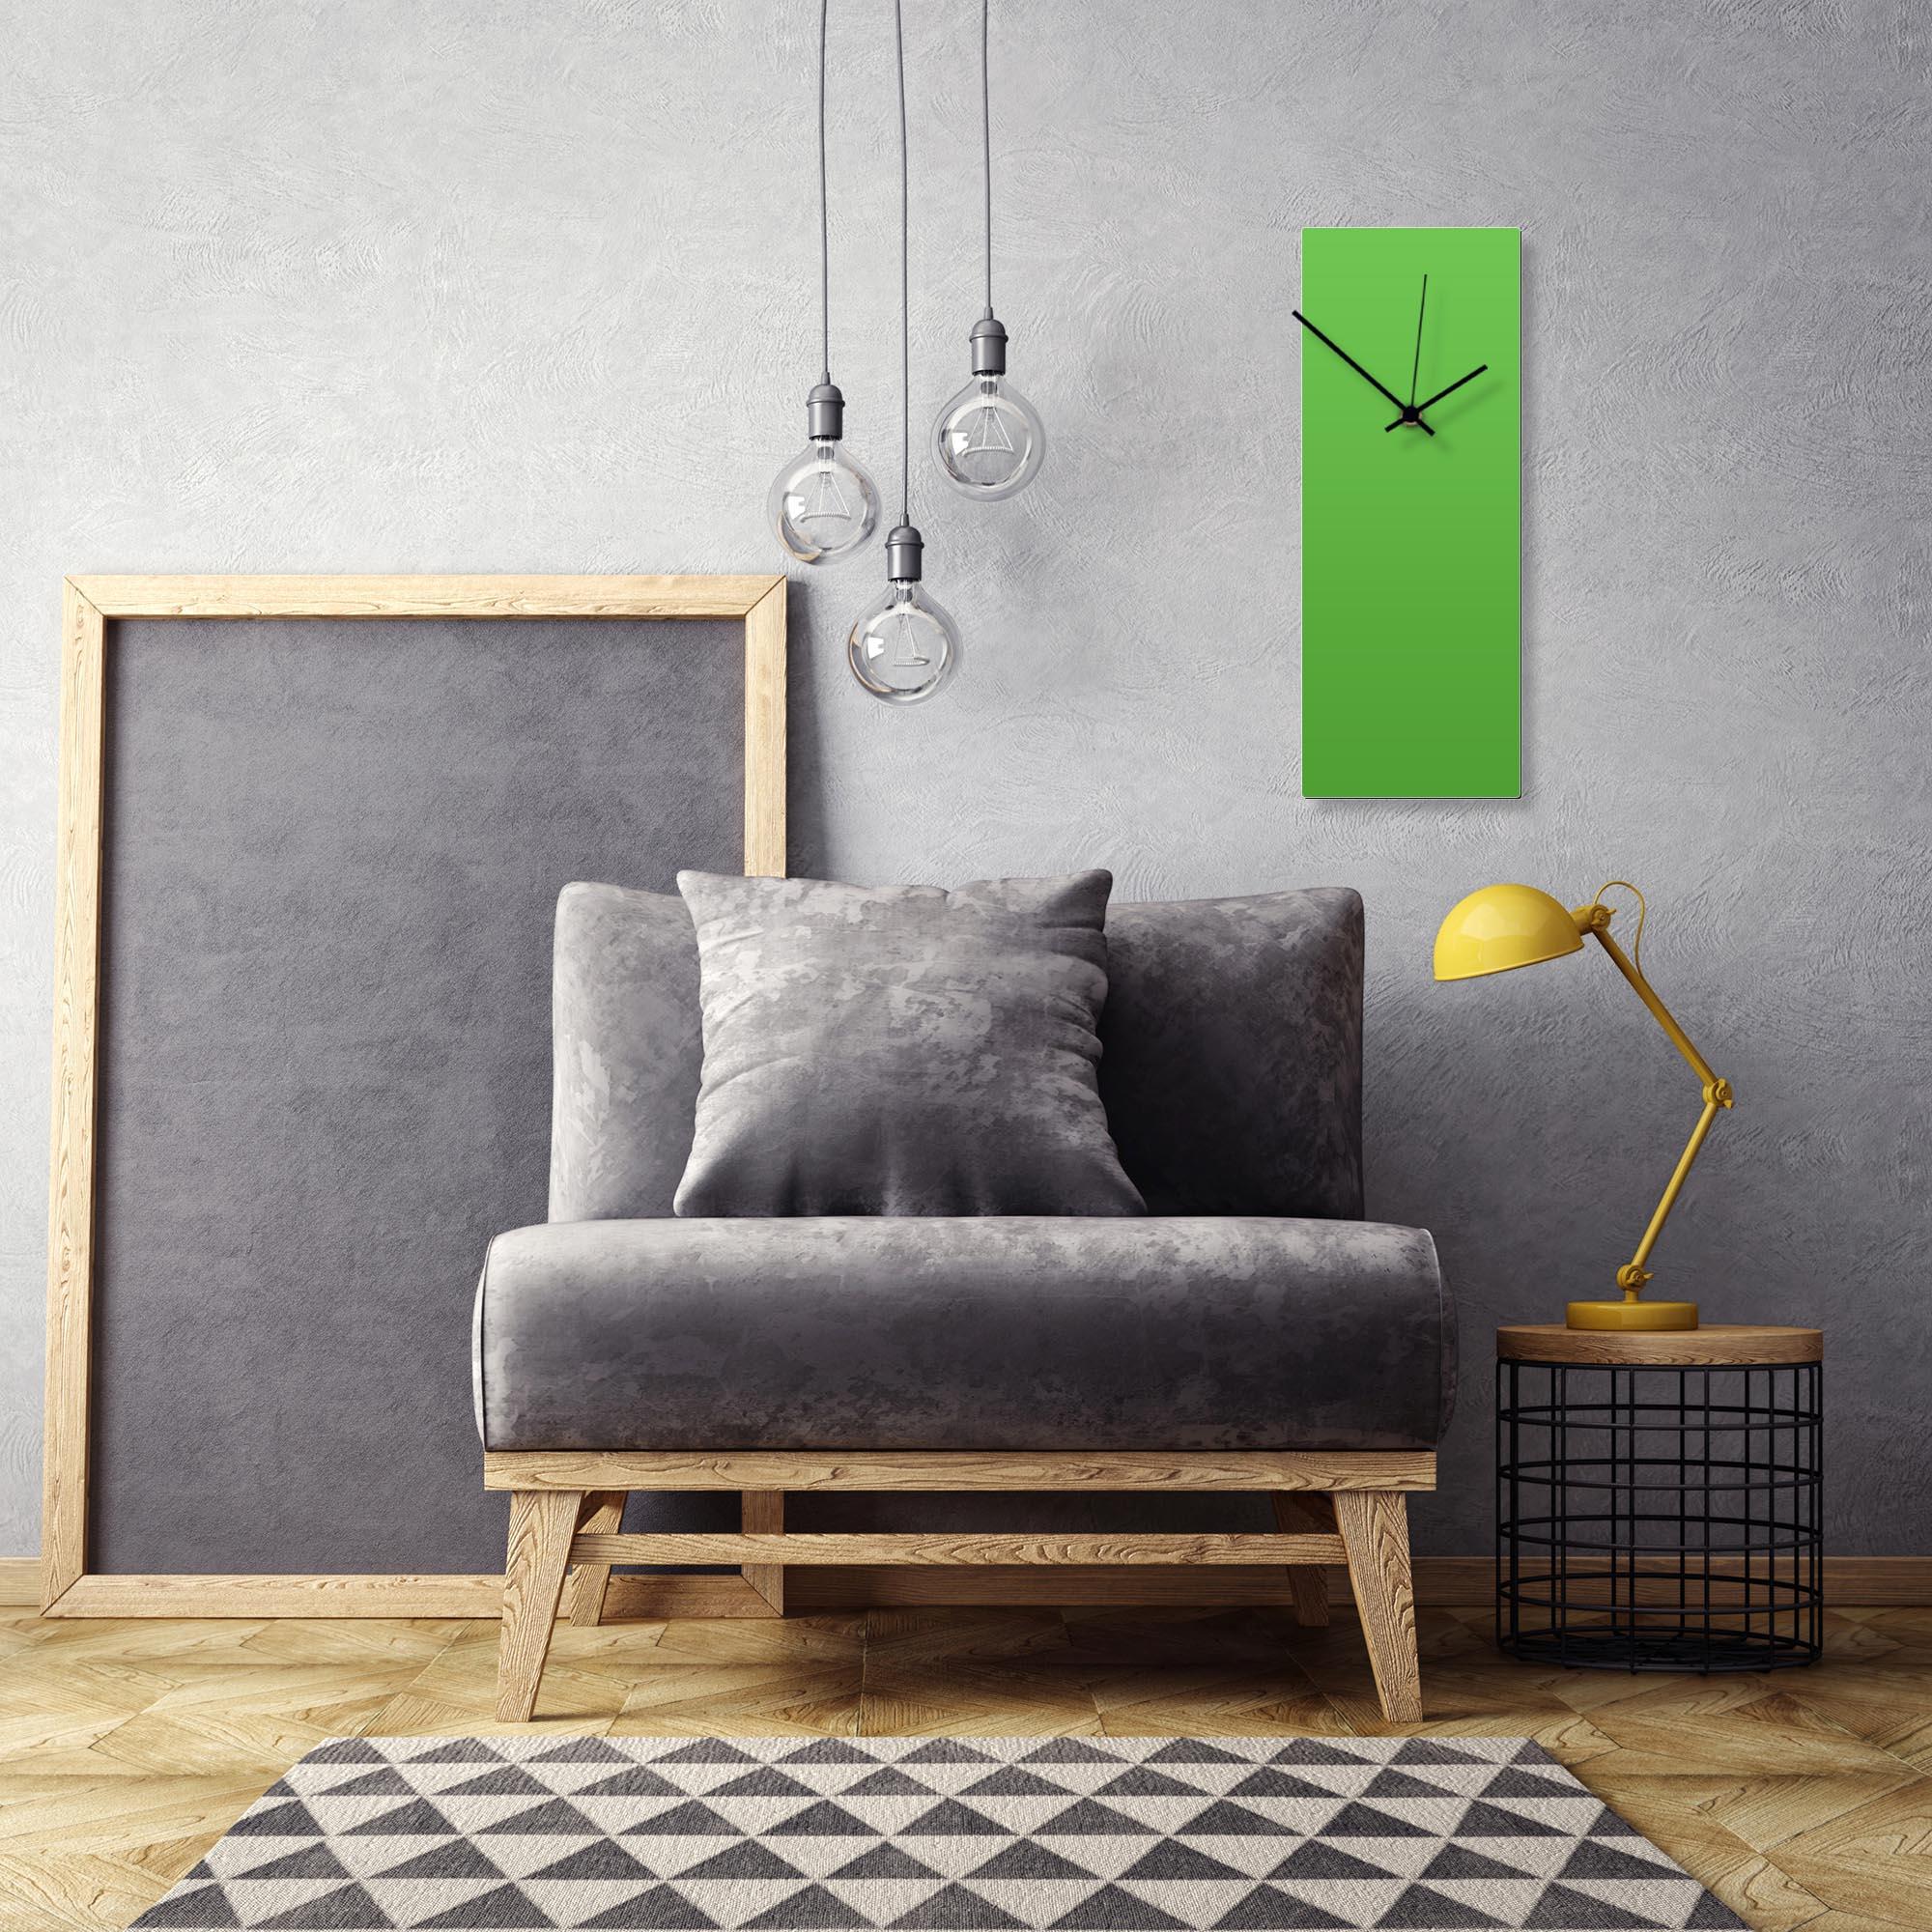 Greenout Black Clock Large by Adam Schwoeppe Contemporary Clock on Aluminum Polymetal - Alternate View 1